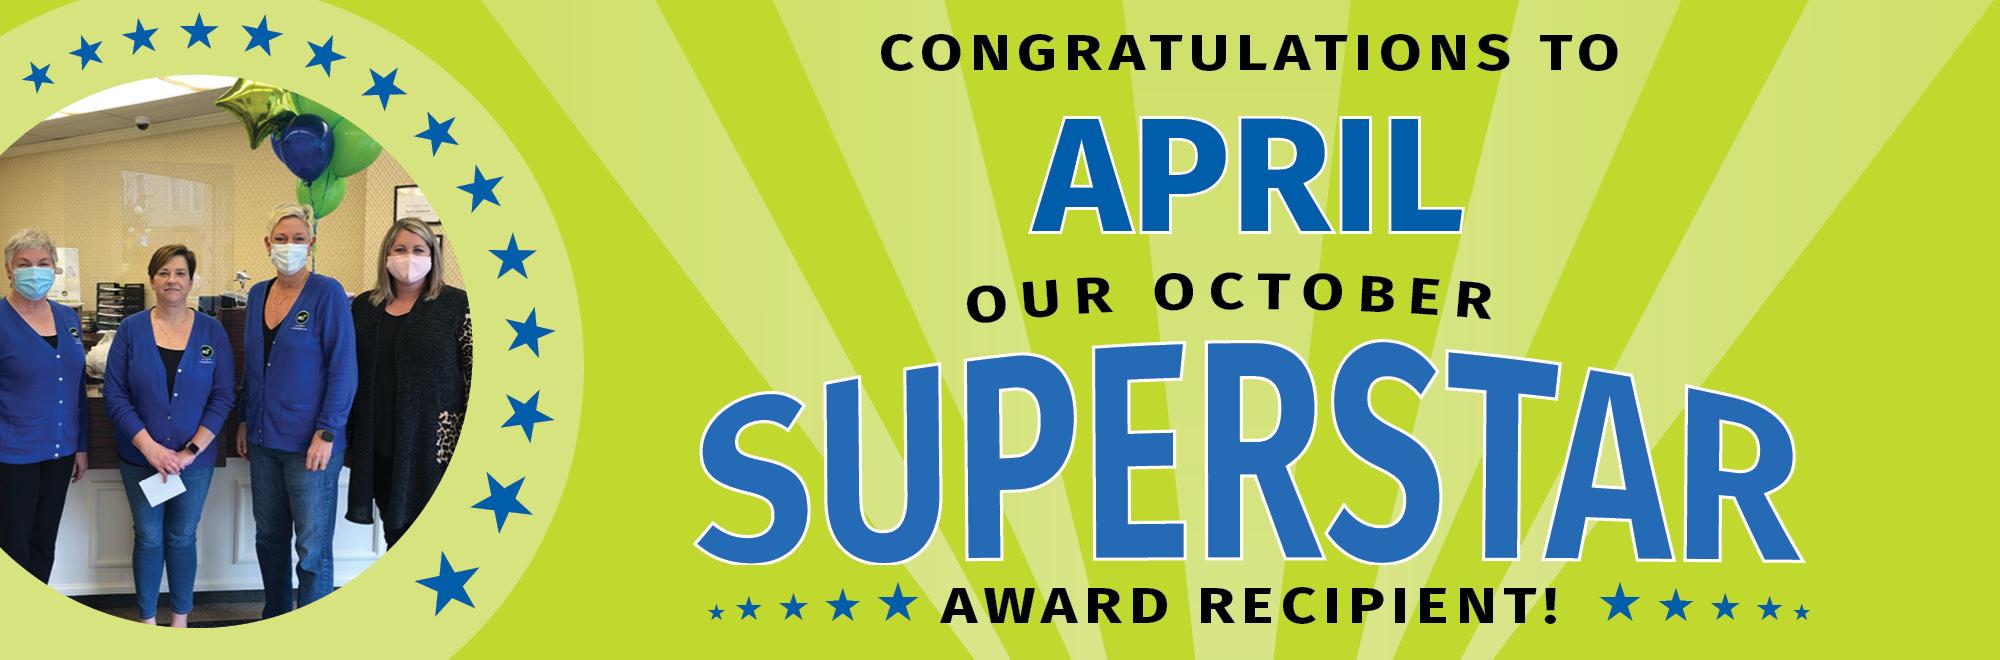 Congralations to April, Our October Superstar Award Recipient!